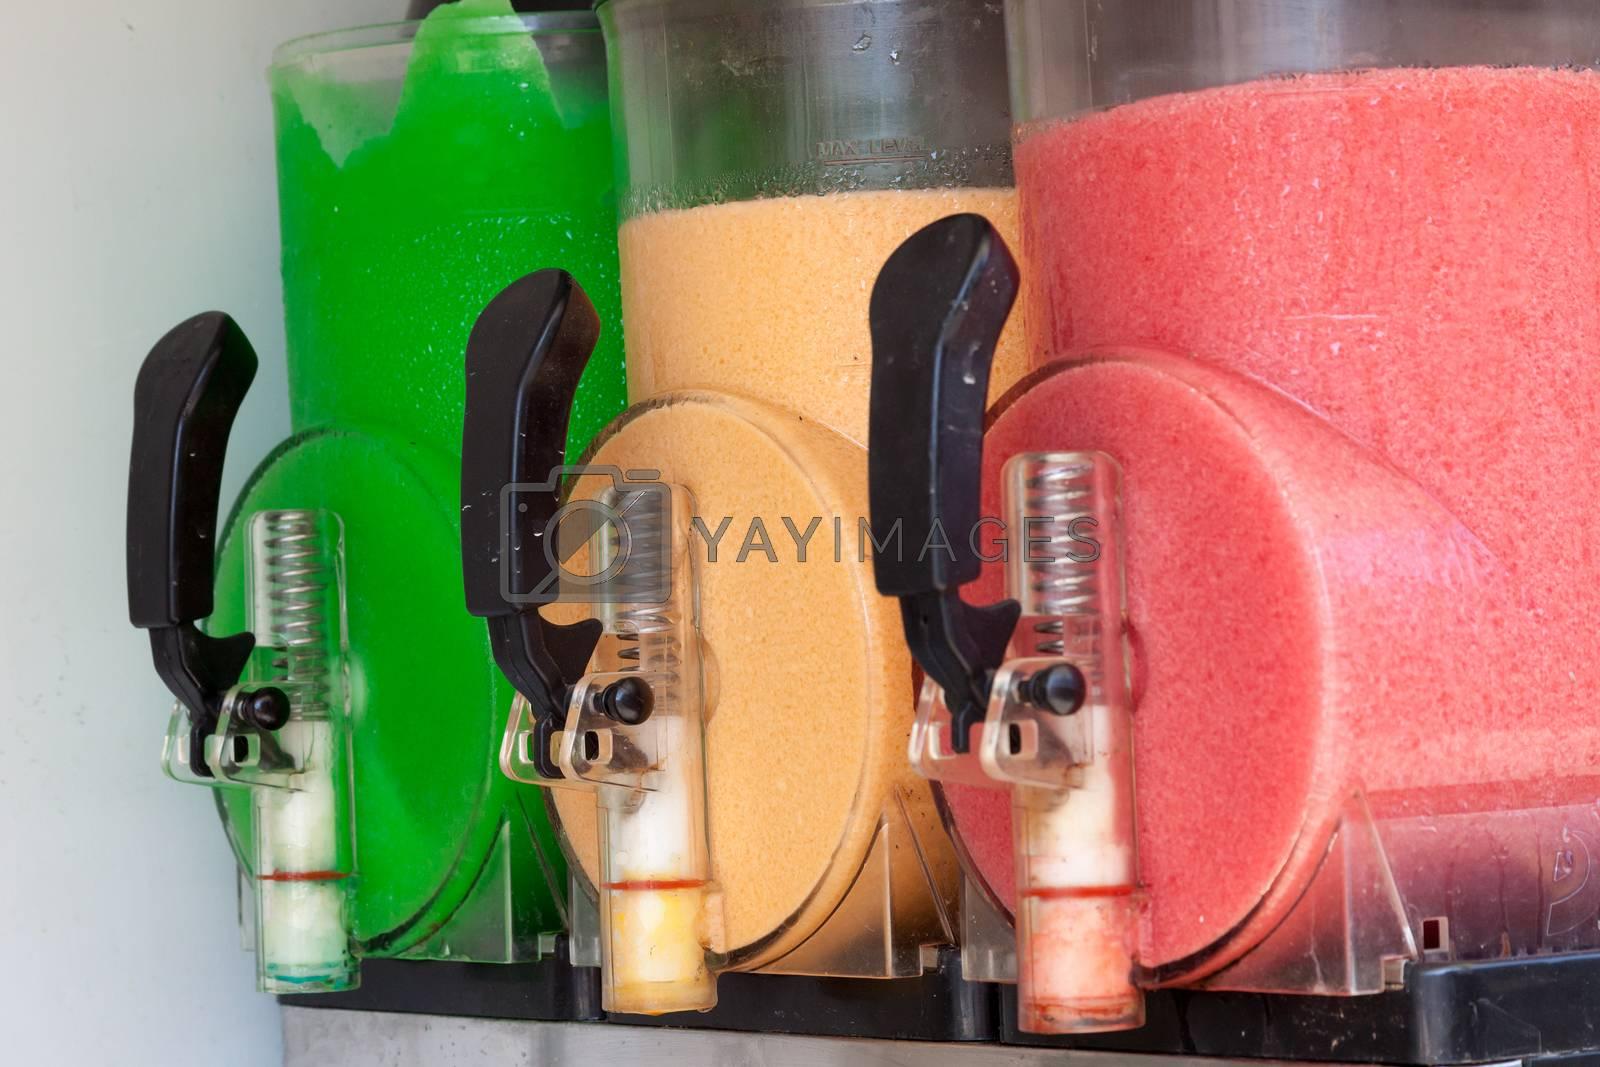 The beautiful machine gun doing the different frozen drinks